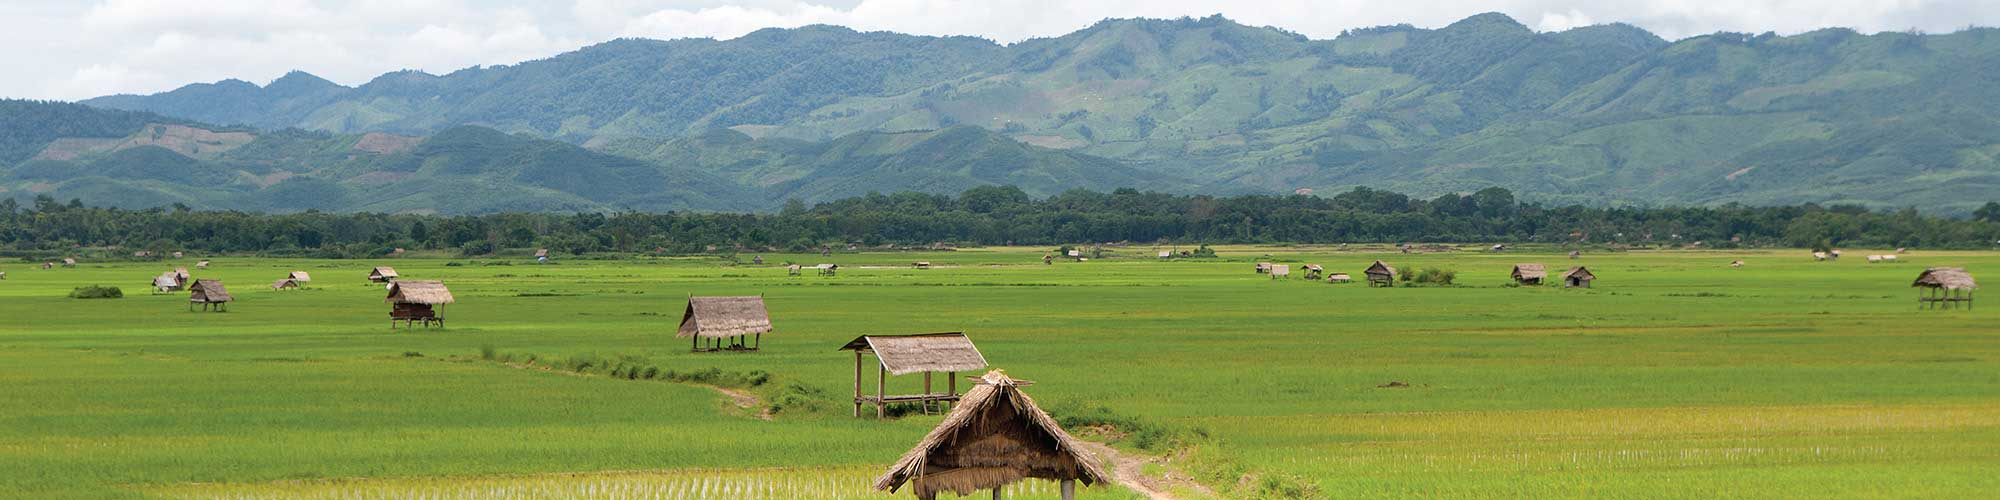 laos-banner-3.jpg